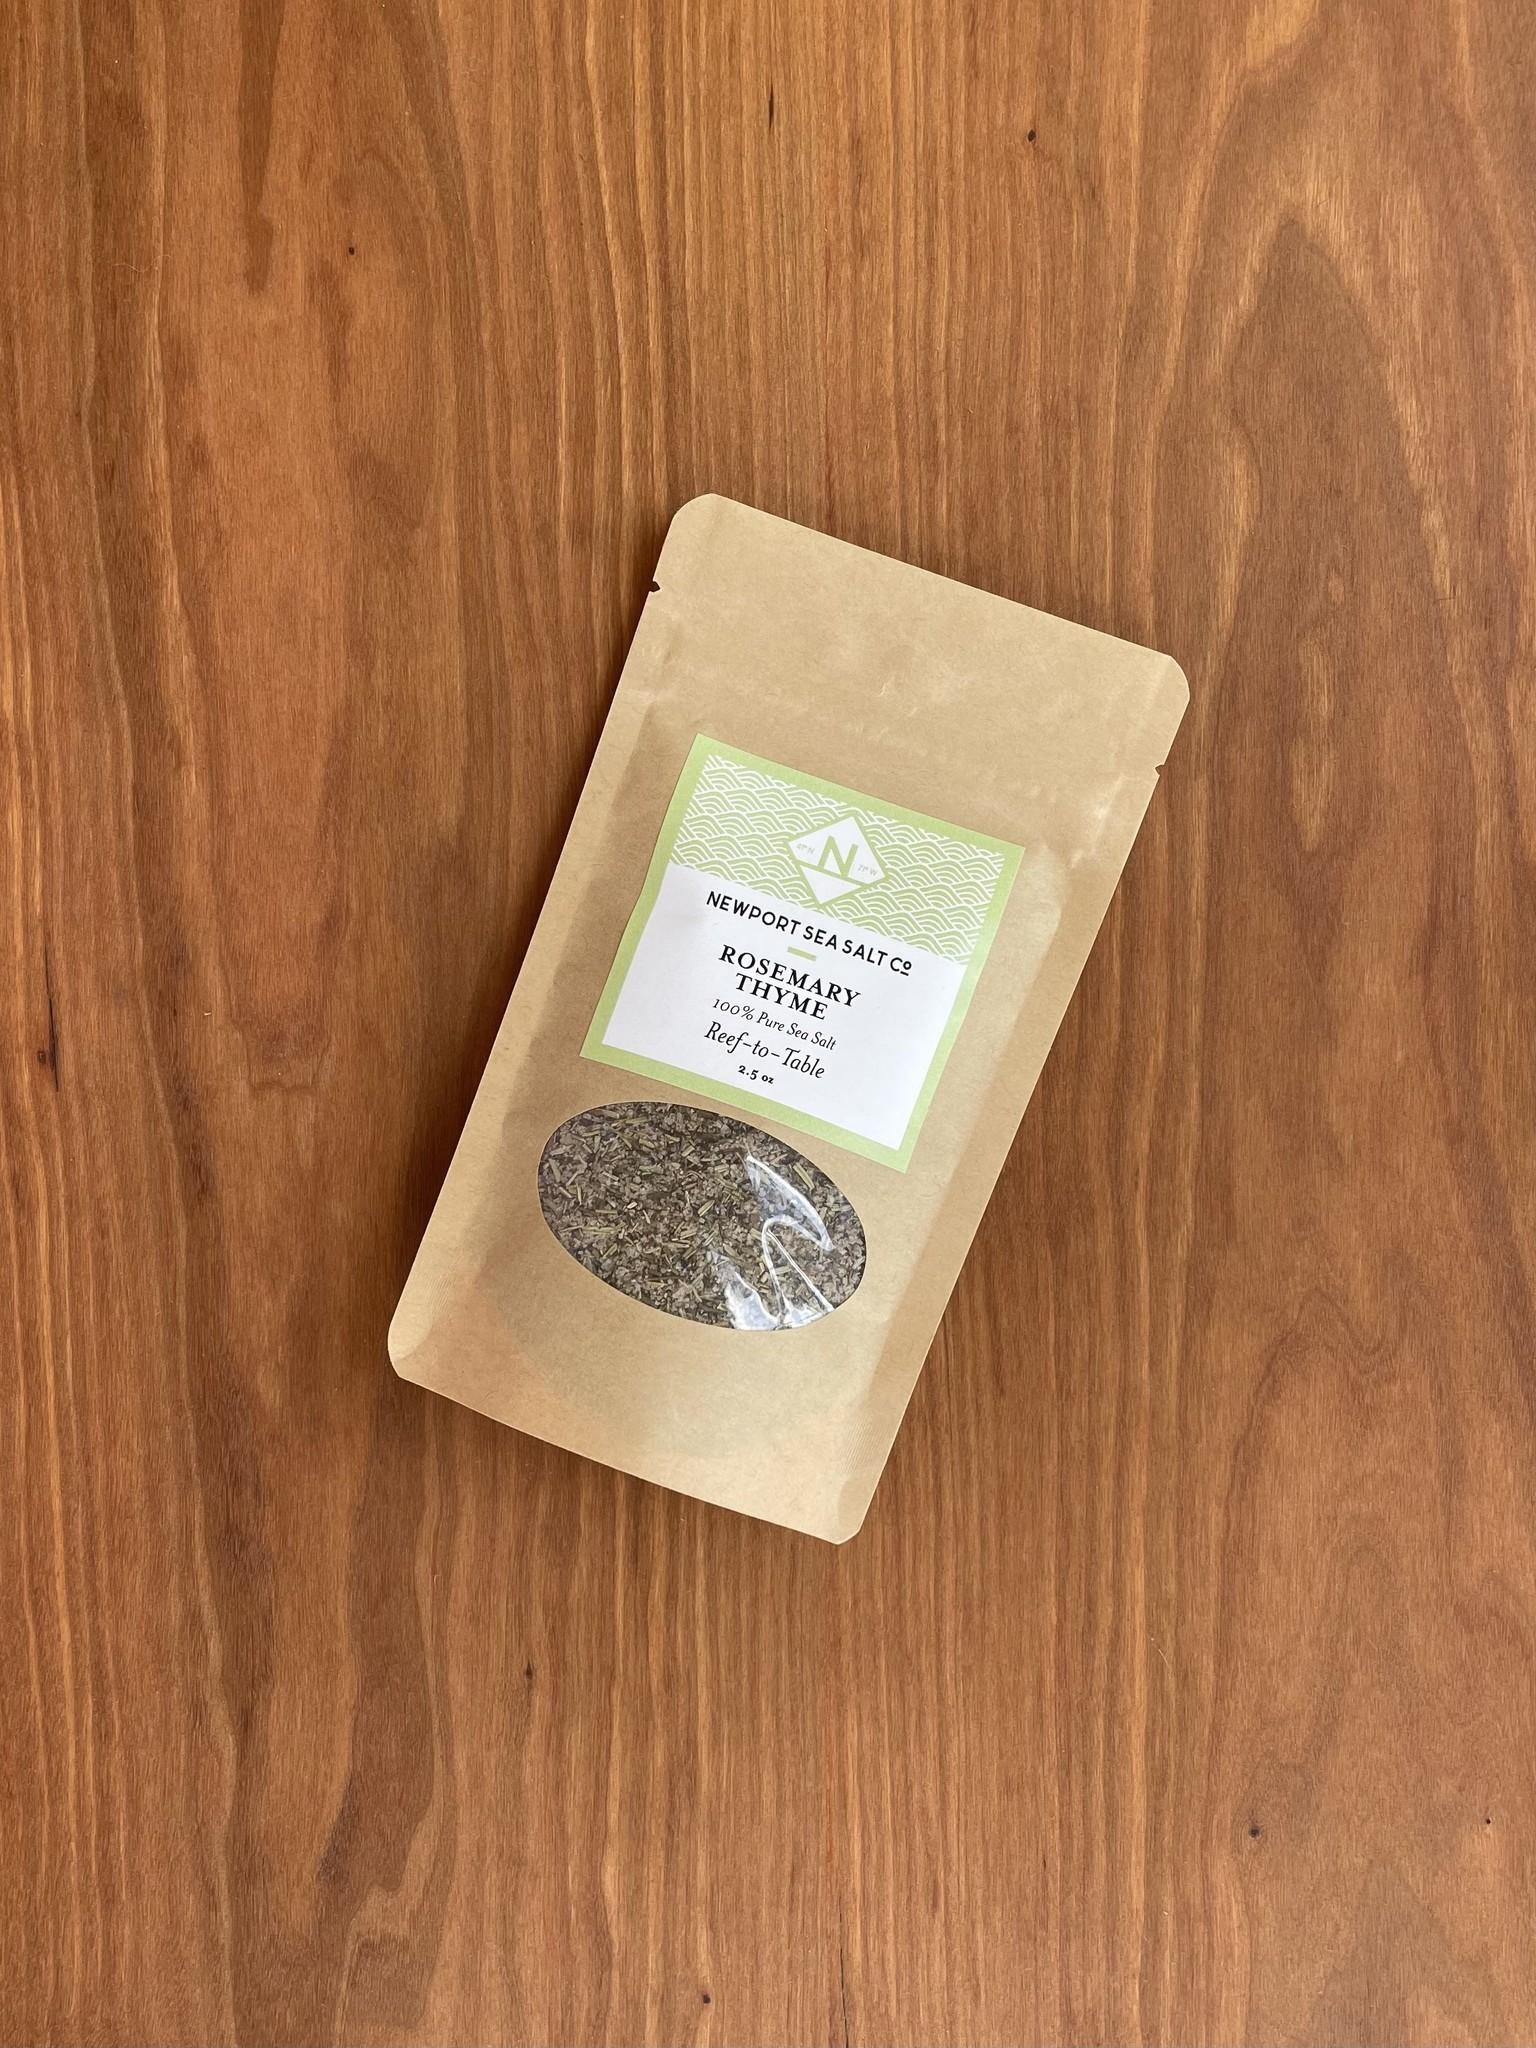 Newport Sea Salt Pouches, 2.5 oz.-4